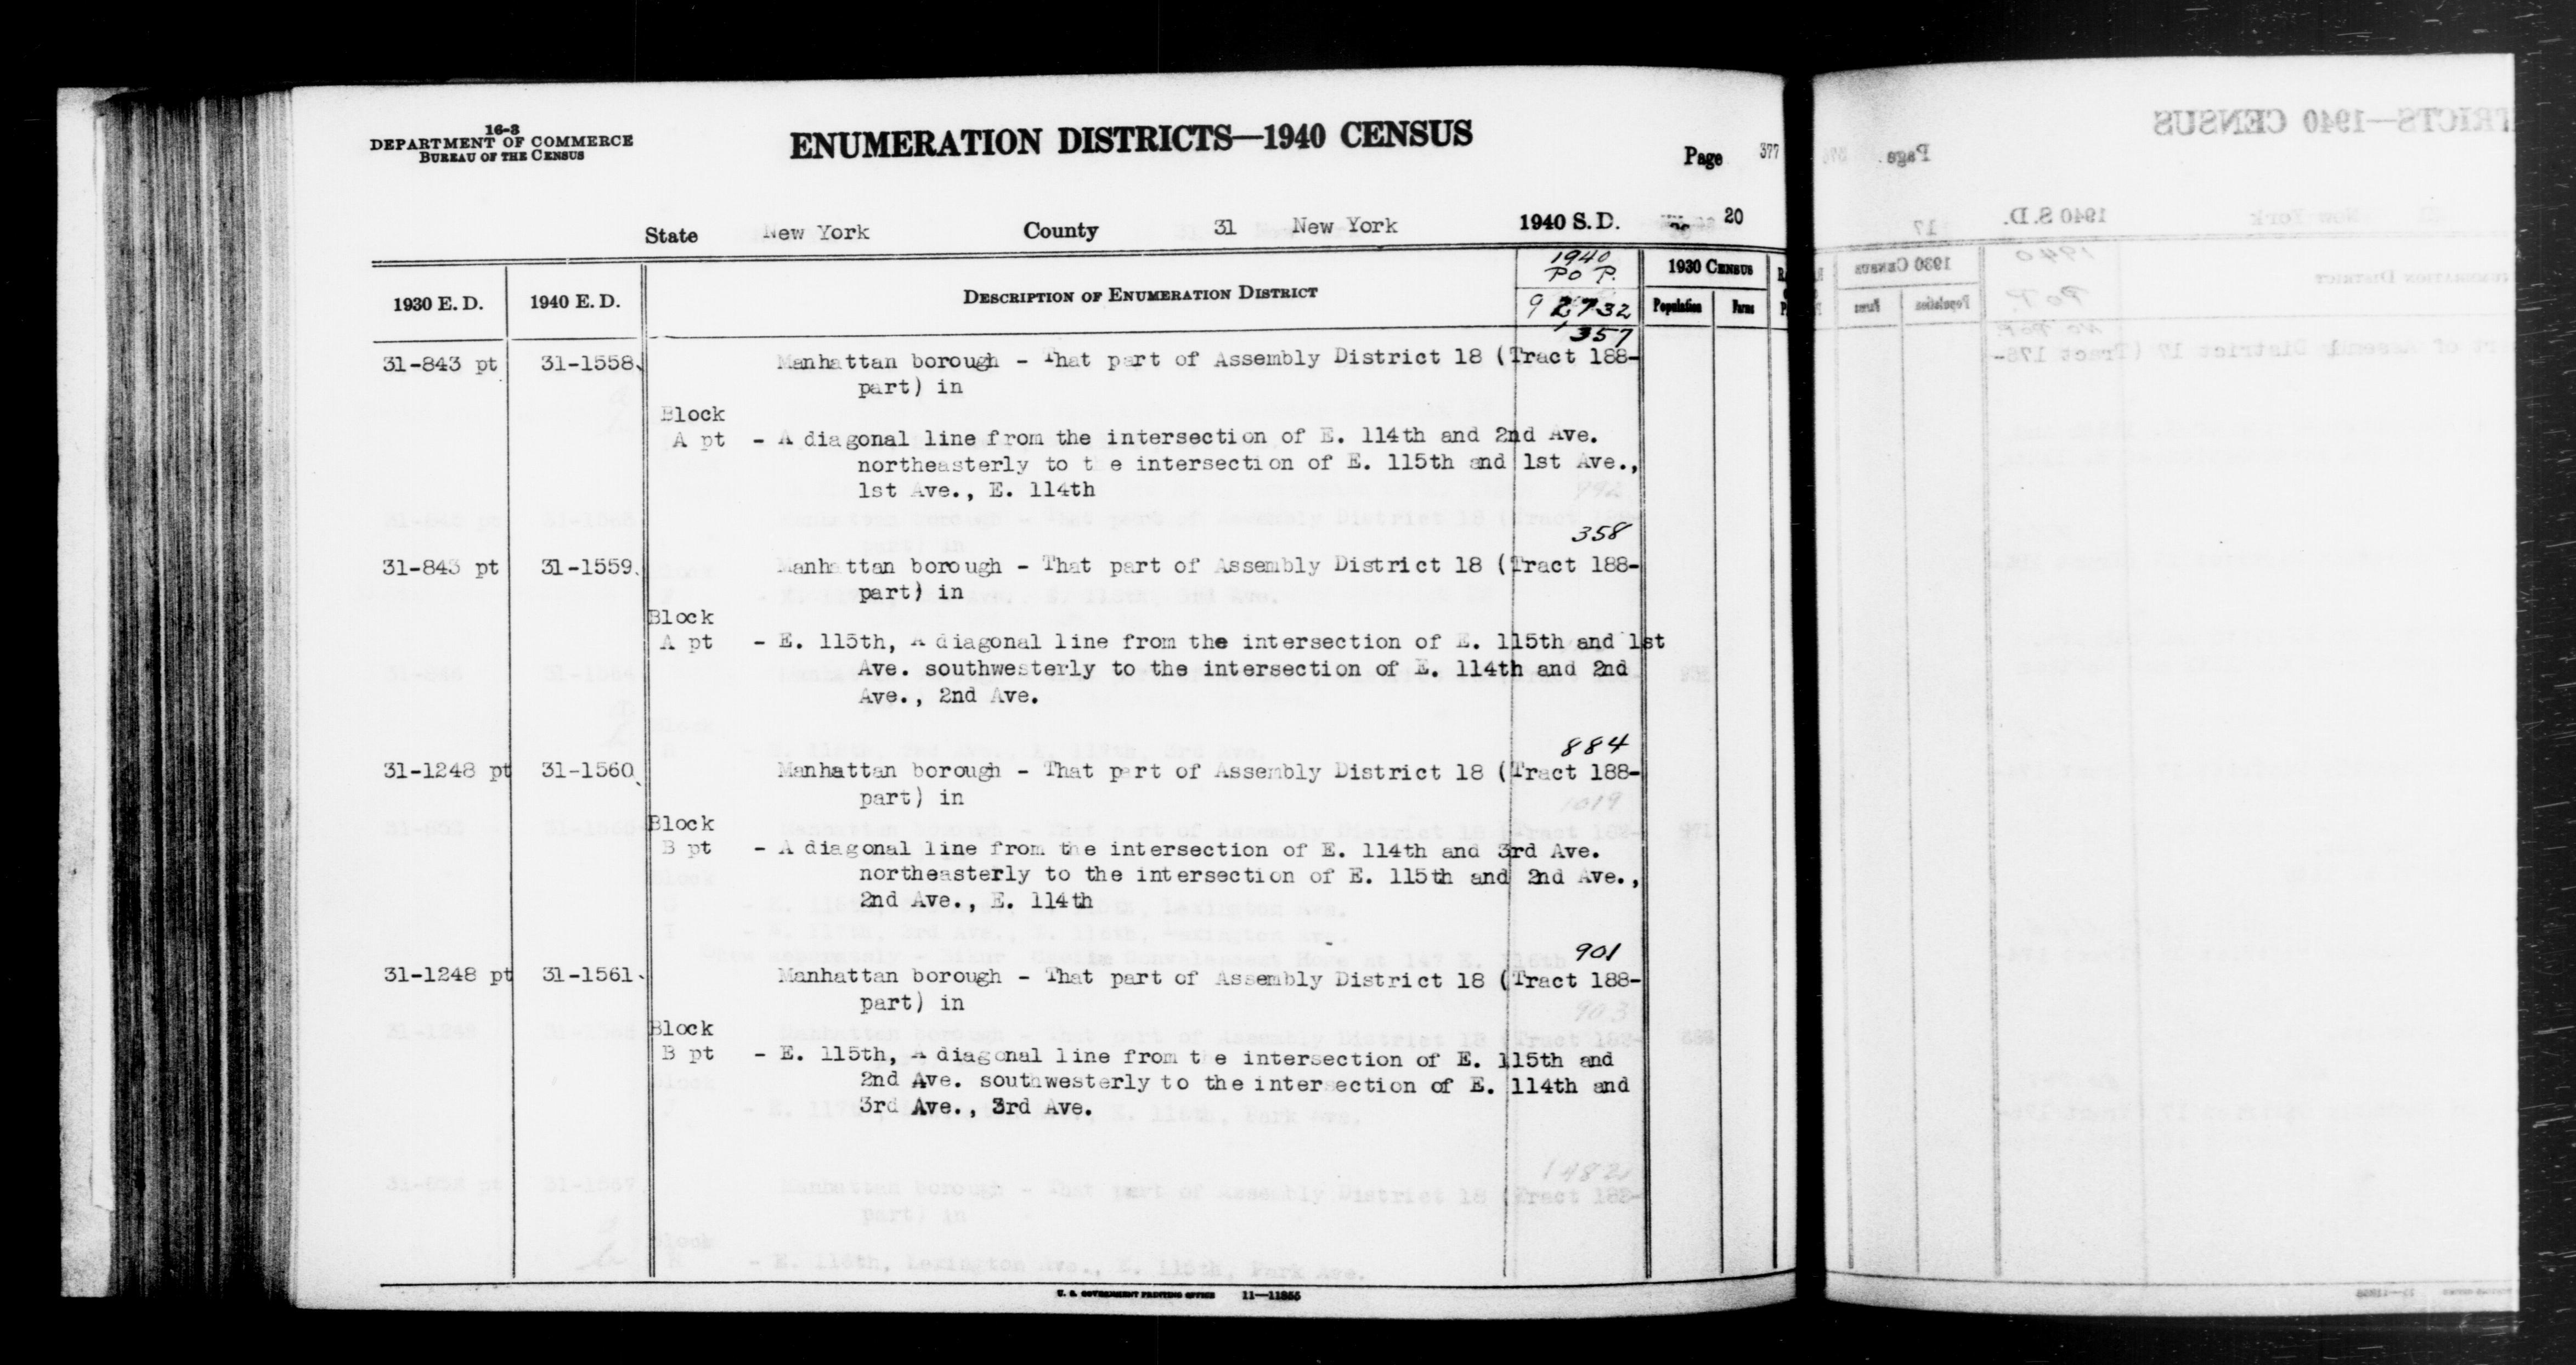 1940 Census Enumeration District Descriptions - New York - New York County - ED 31-1558, ED 31-1559, ED 31-1560, ED 31-1561